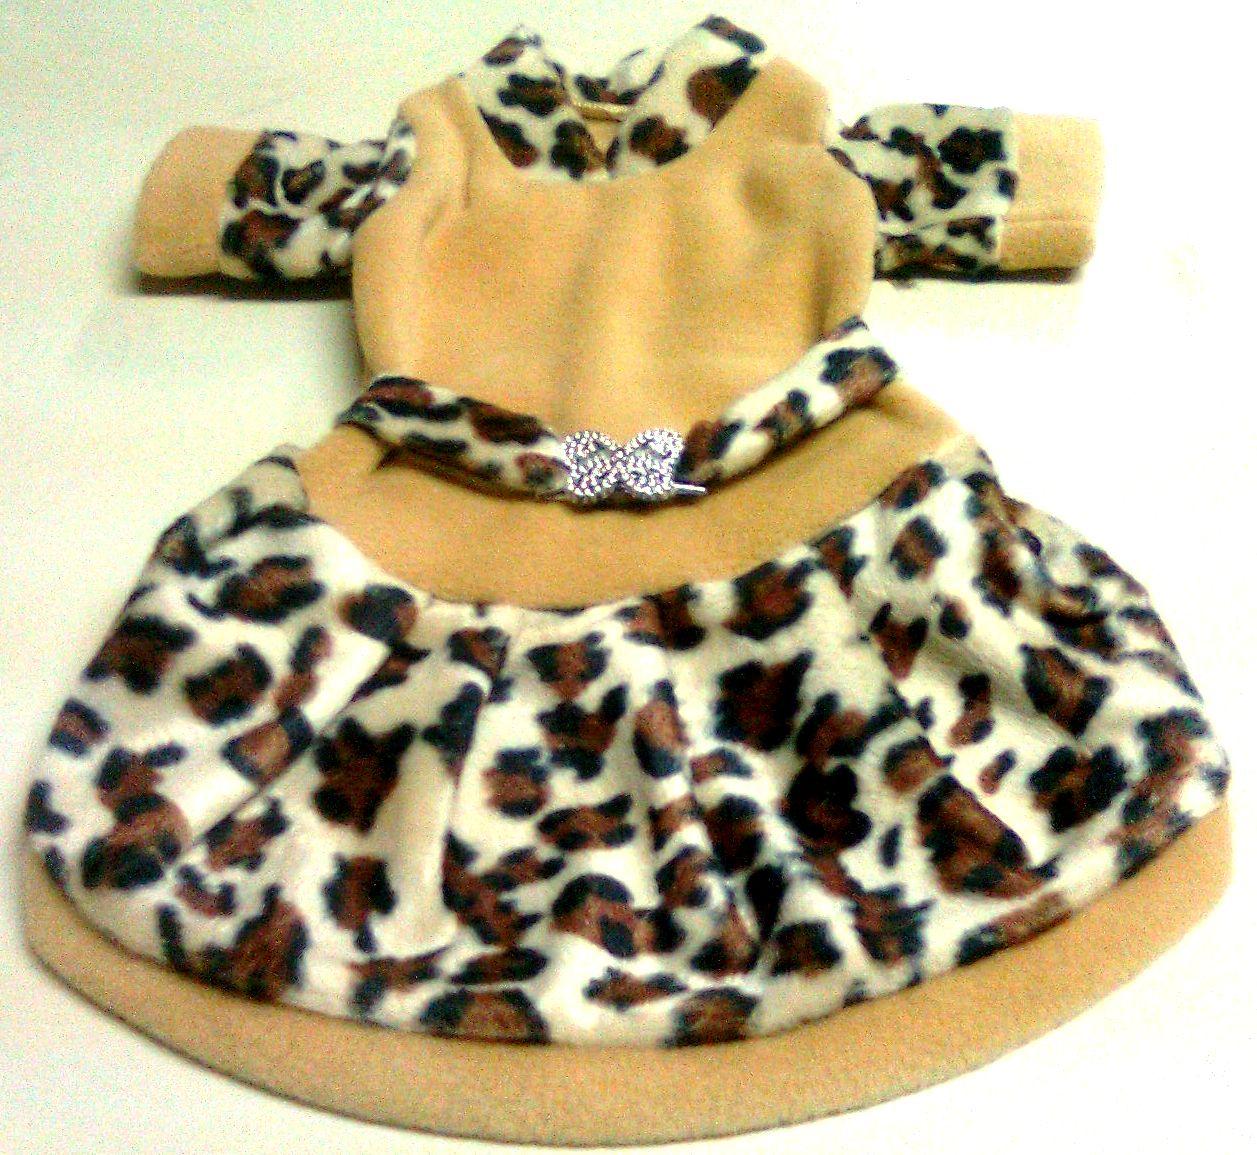 http://3.bp.blogspot.com/-Atg3zuk_tDc/TinkMsqZXhI/AAAAAAAAAjA/ny6FJEiVOhg/s1600/vestido%2Btigrado%2Bpel%25C3%25ADcia.jpg